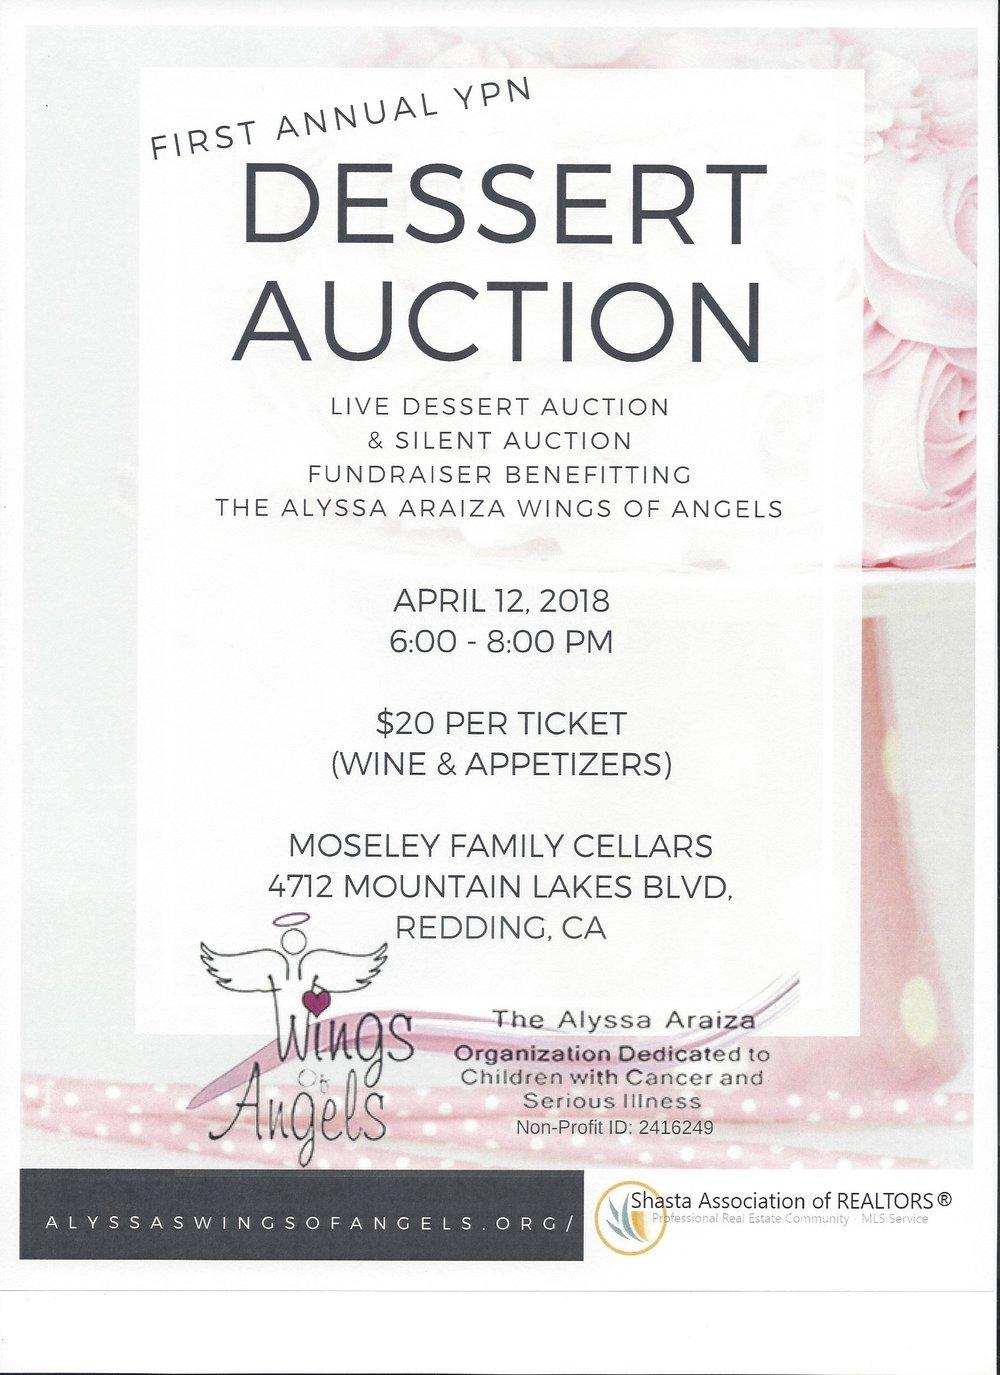 18-03-09;YPN Dessert Auction 2018.jpg